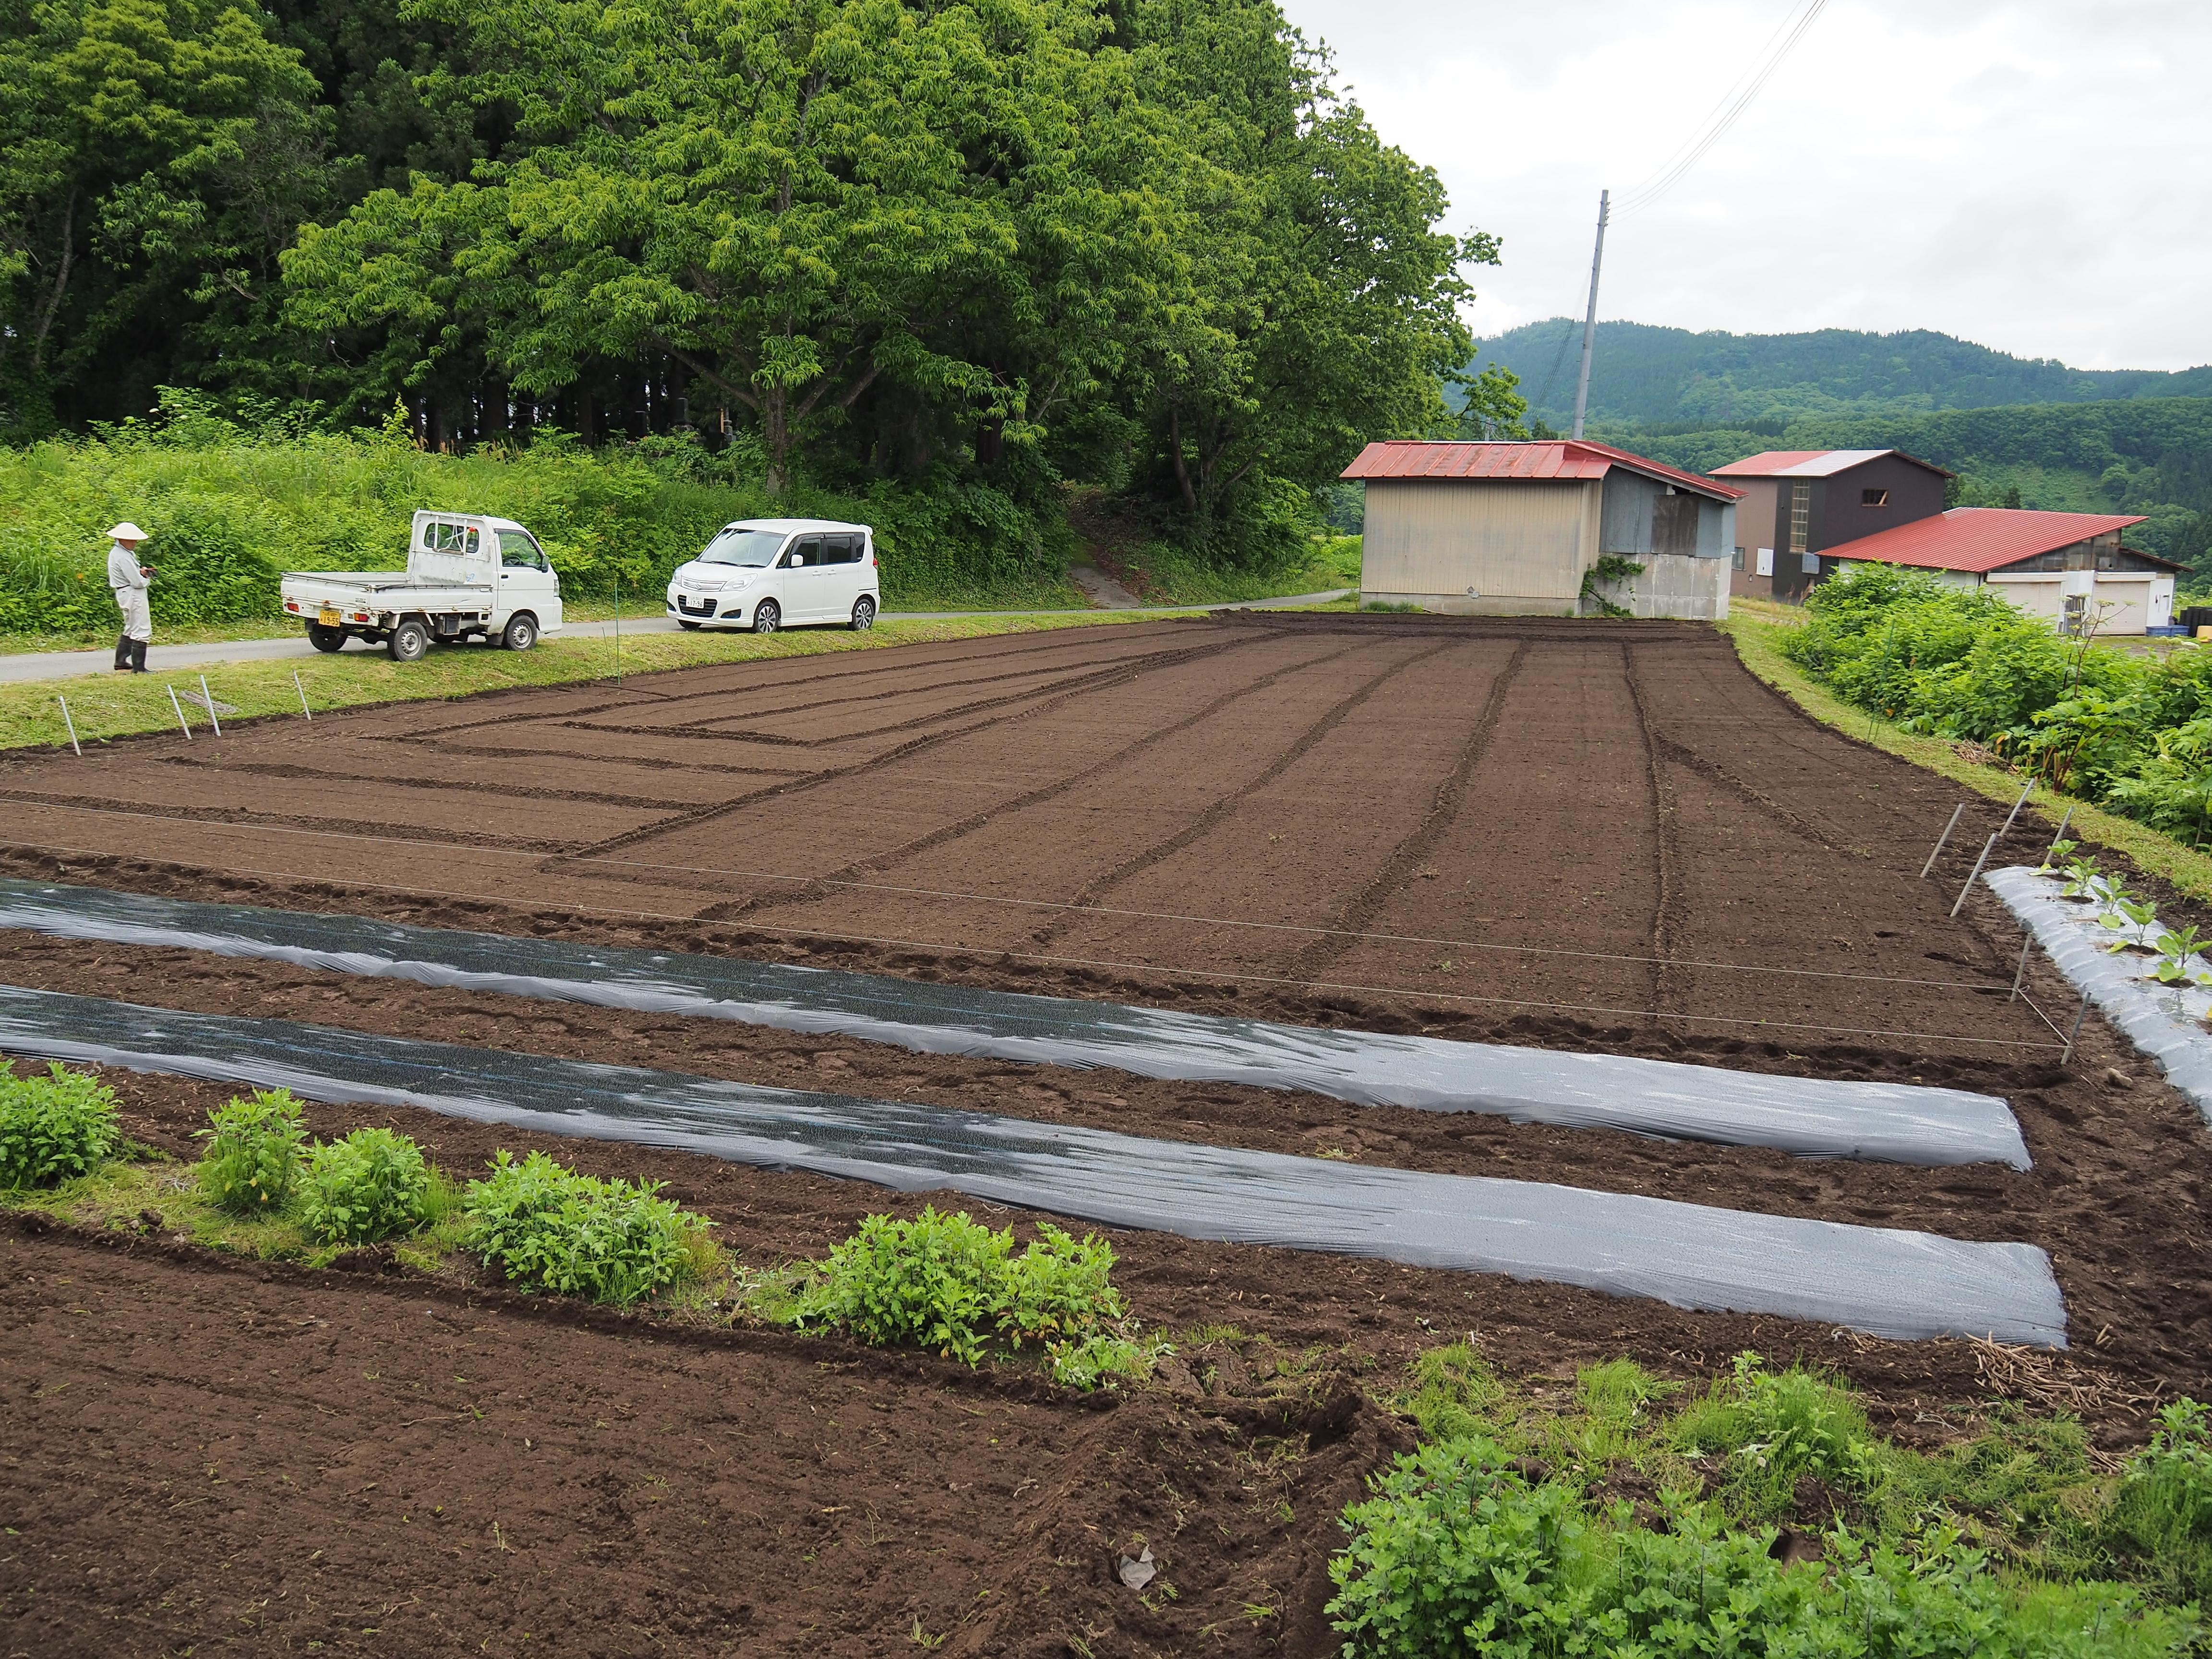 P6170004 - 山形県戸沢村での農業イベント